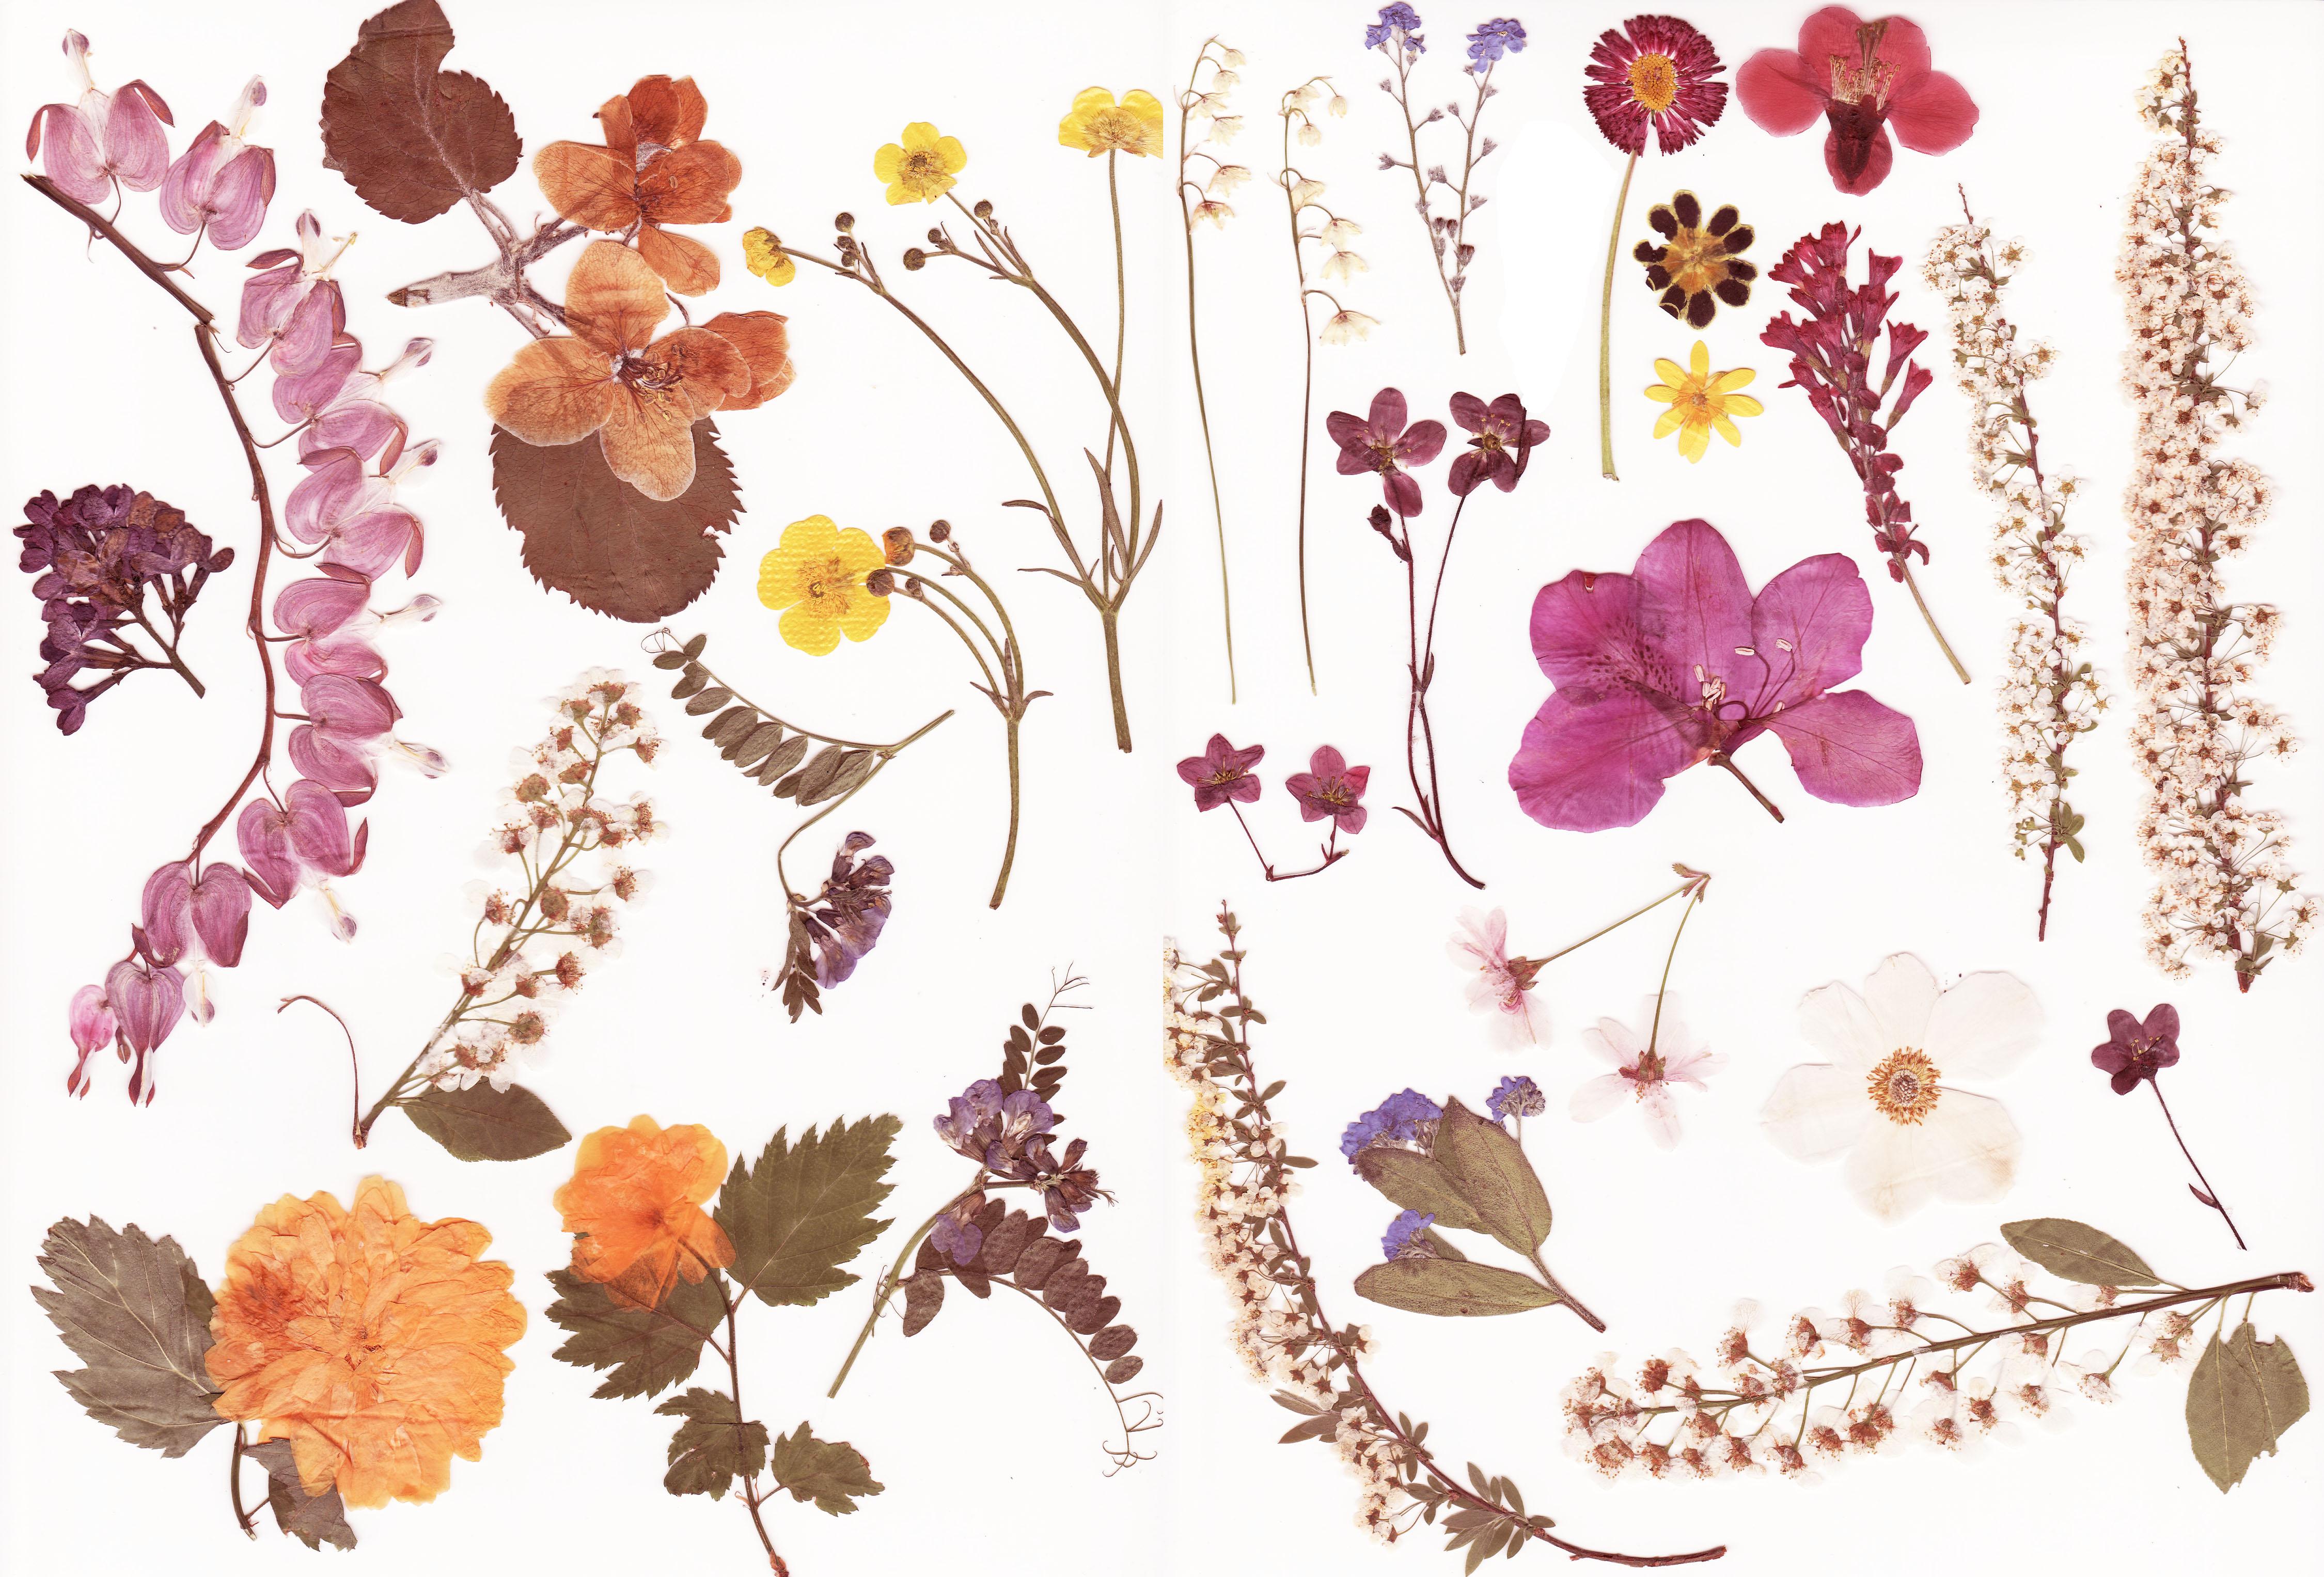 Pressed flowers stock by Rocktuete 4500×3054